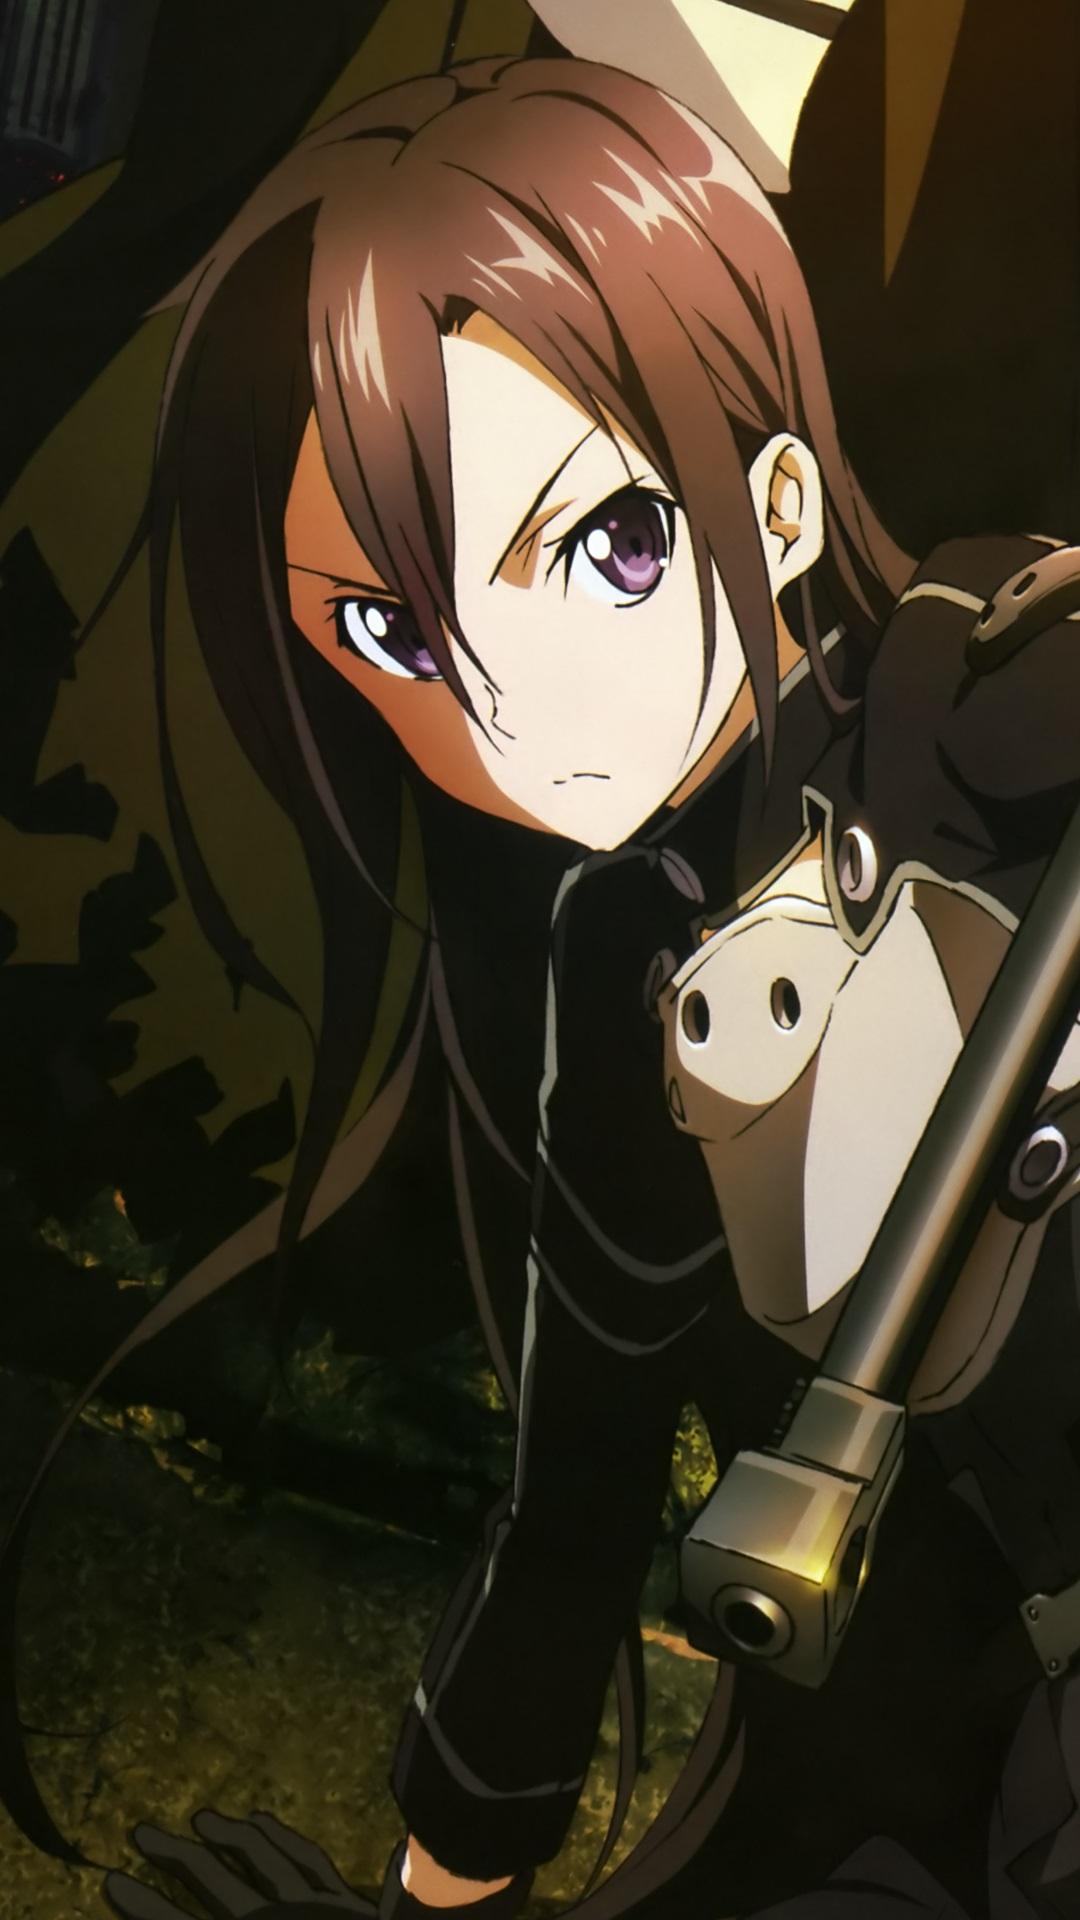 Sword Art Online 2 Kirito 1080x1920